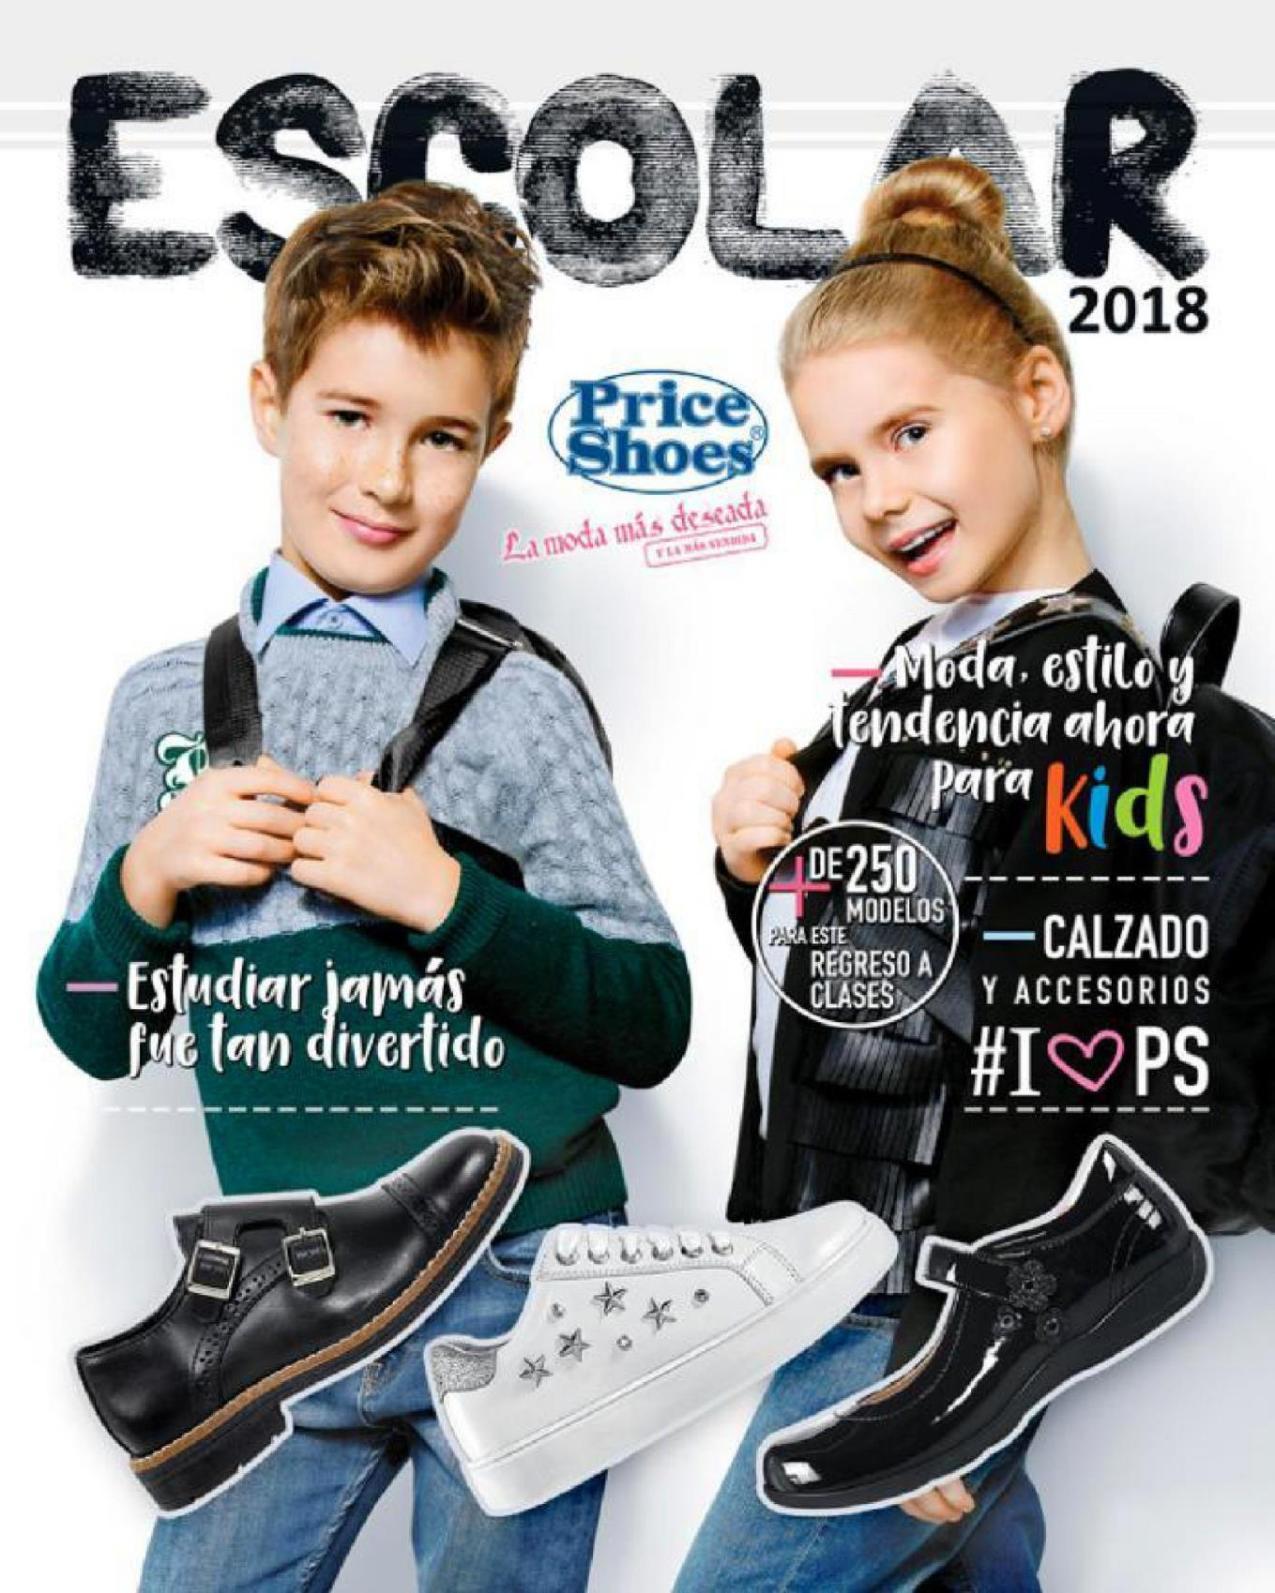 Price Shoes - 2018/12/31 - Catálogo Price Shoes